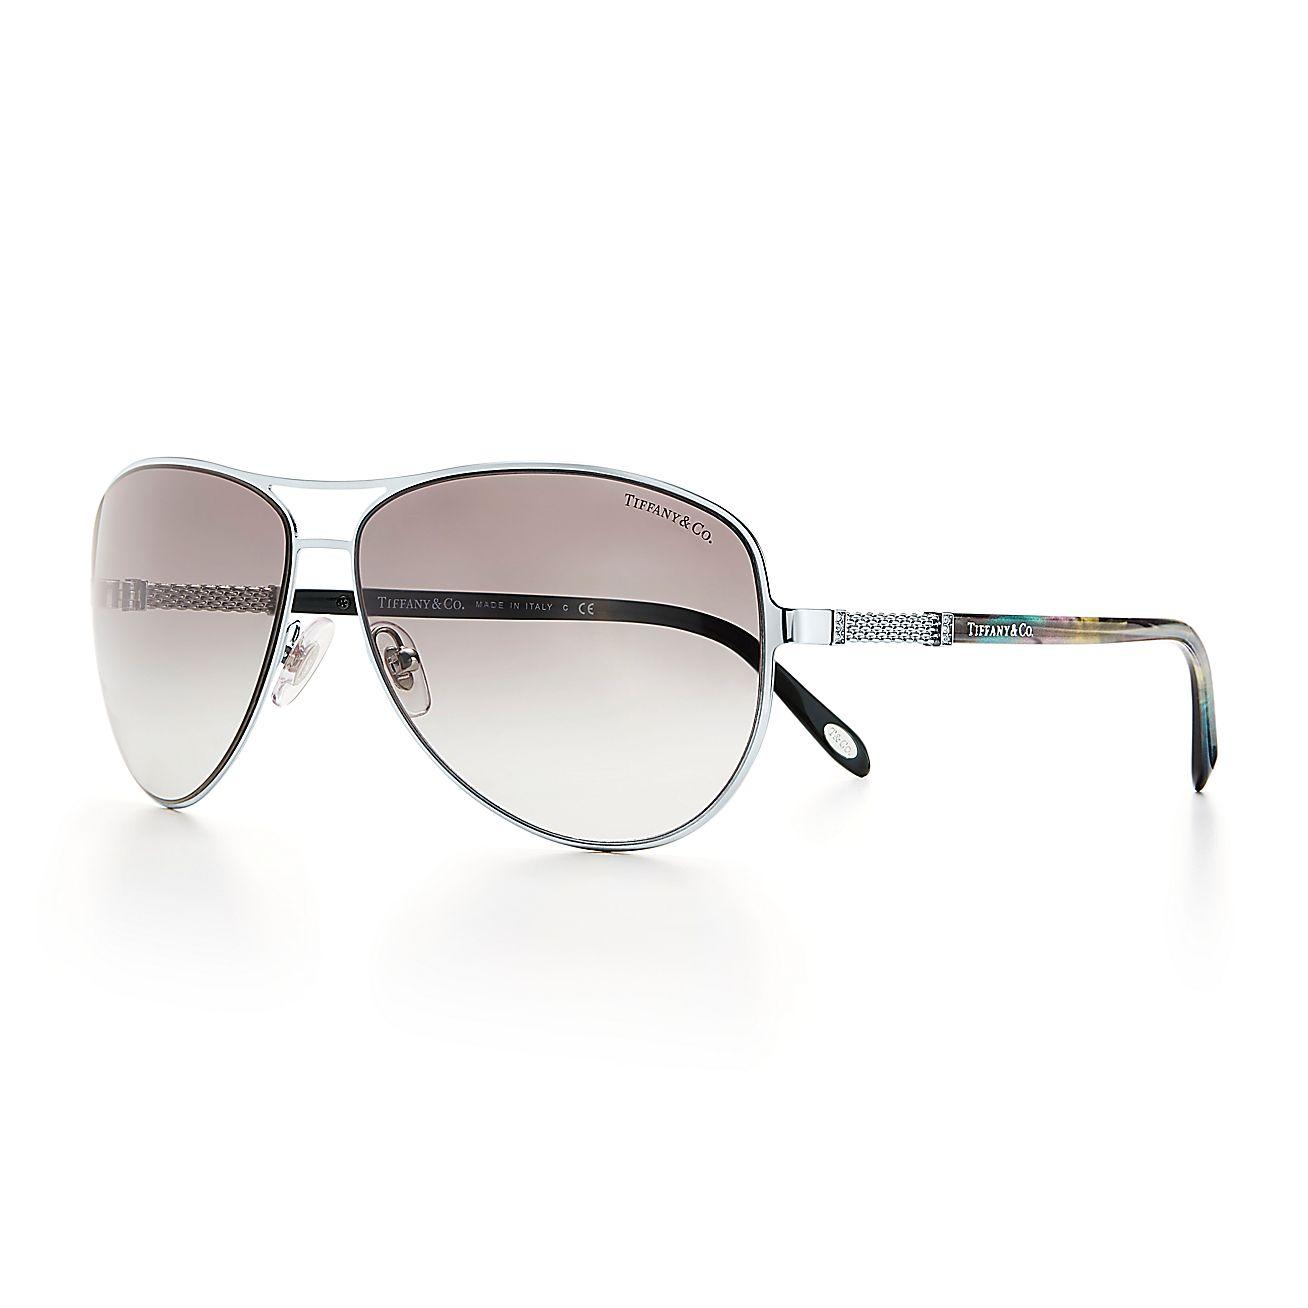 d3a30eed3f8 Tiffany Aviator Sunglasses Silver « Heritage Malta